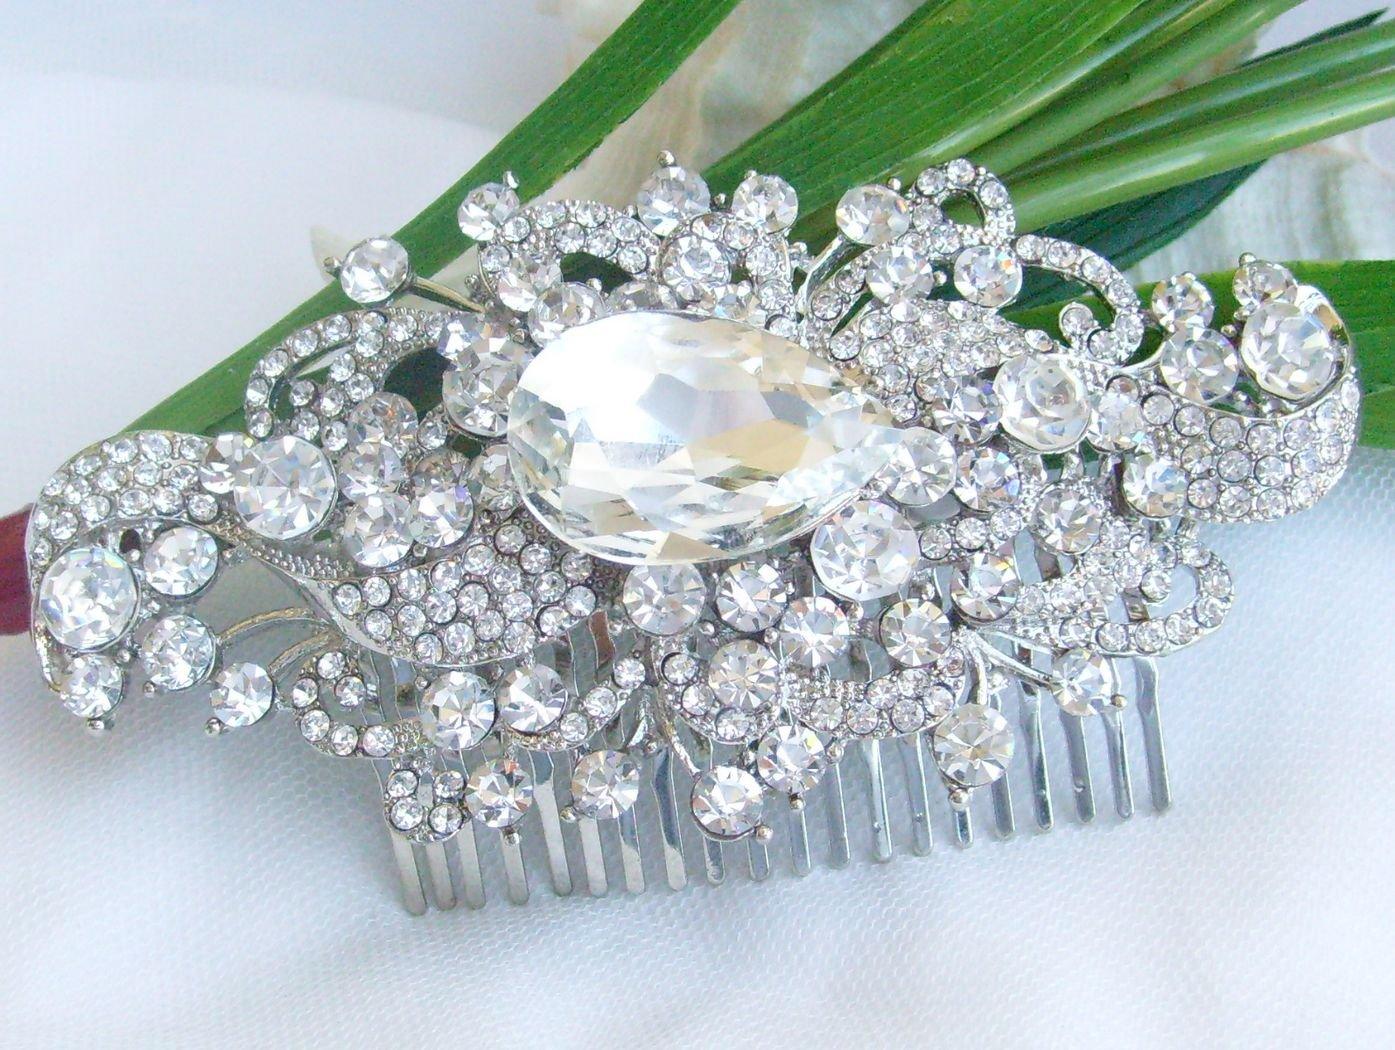 Sindary Wedding Headpiece 4.53 Inch Silver-tone Clear Rhinestone Crystal Flower Hair Comb by Sindary Jewelry (Image #2)